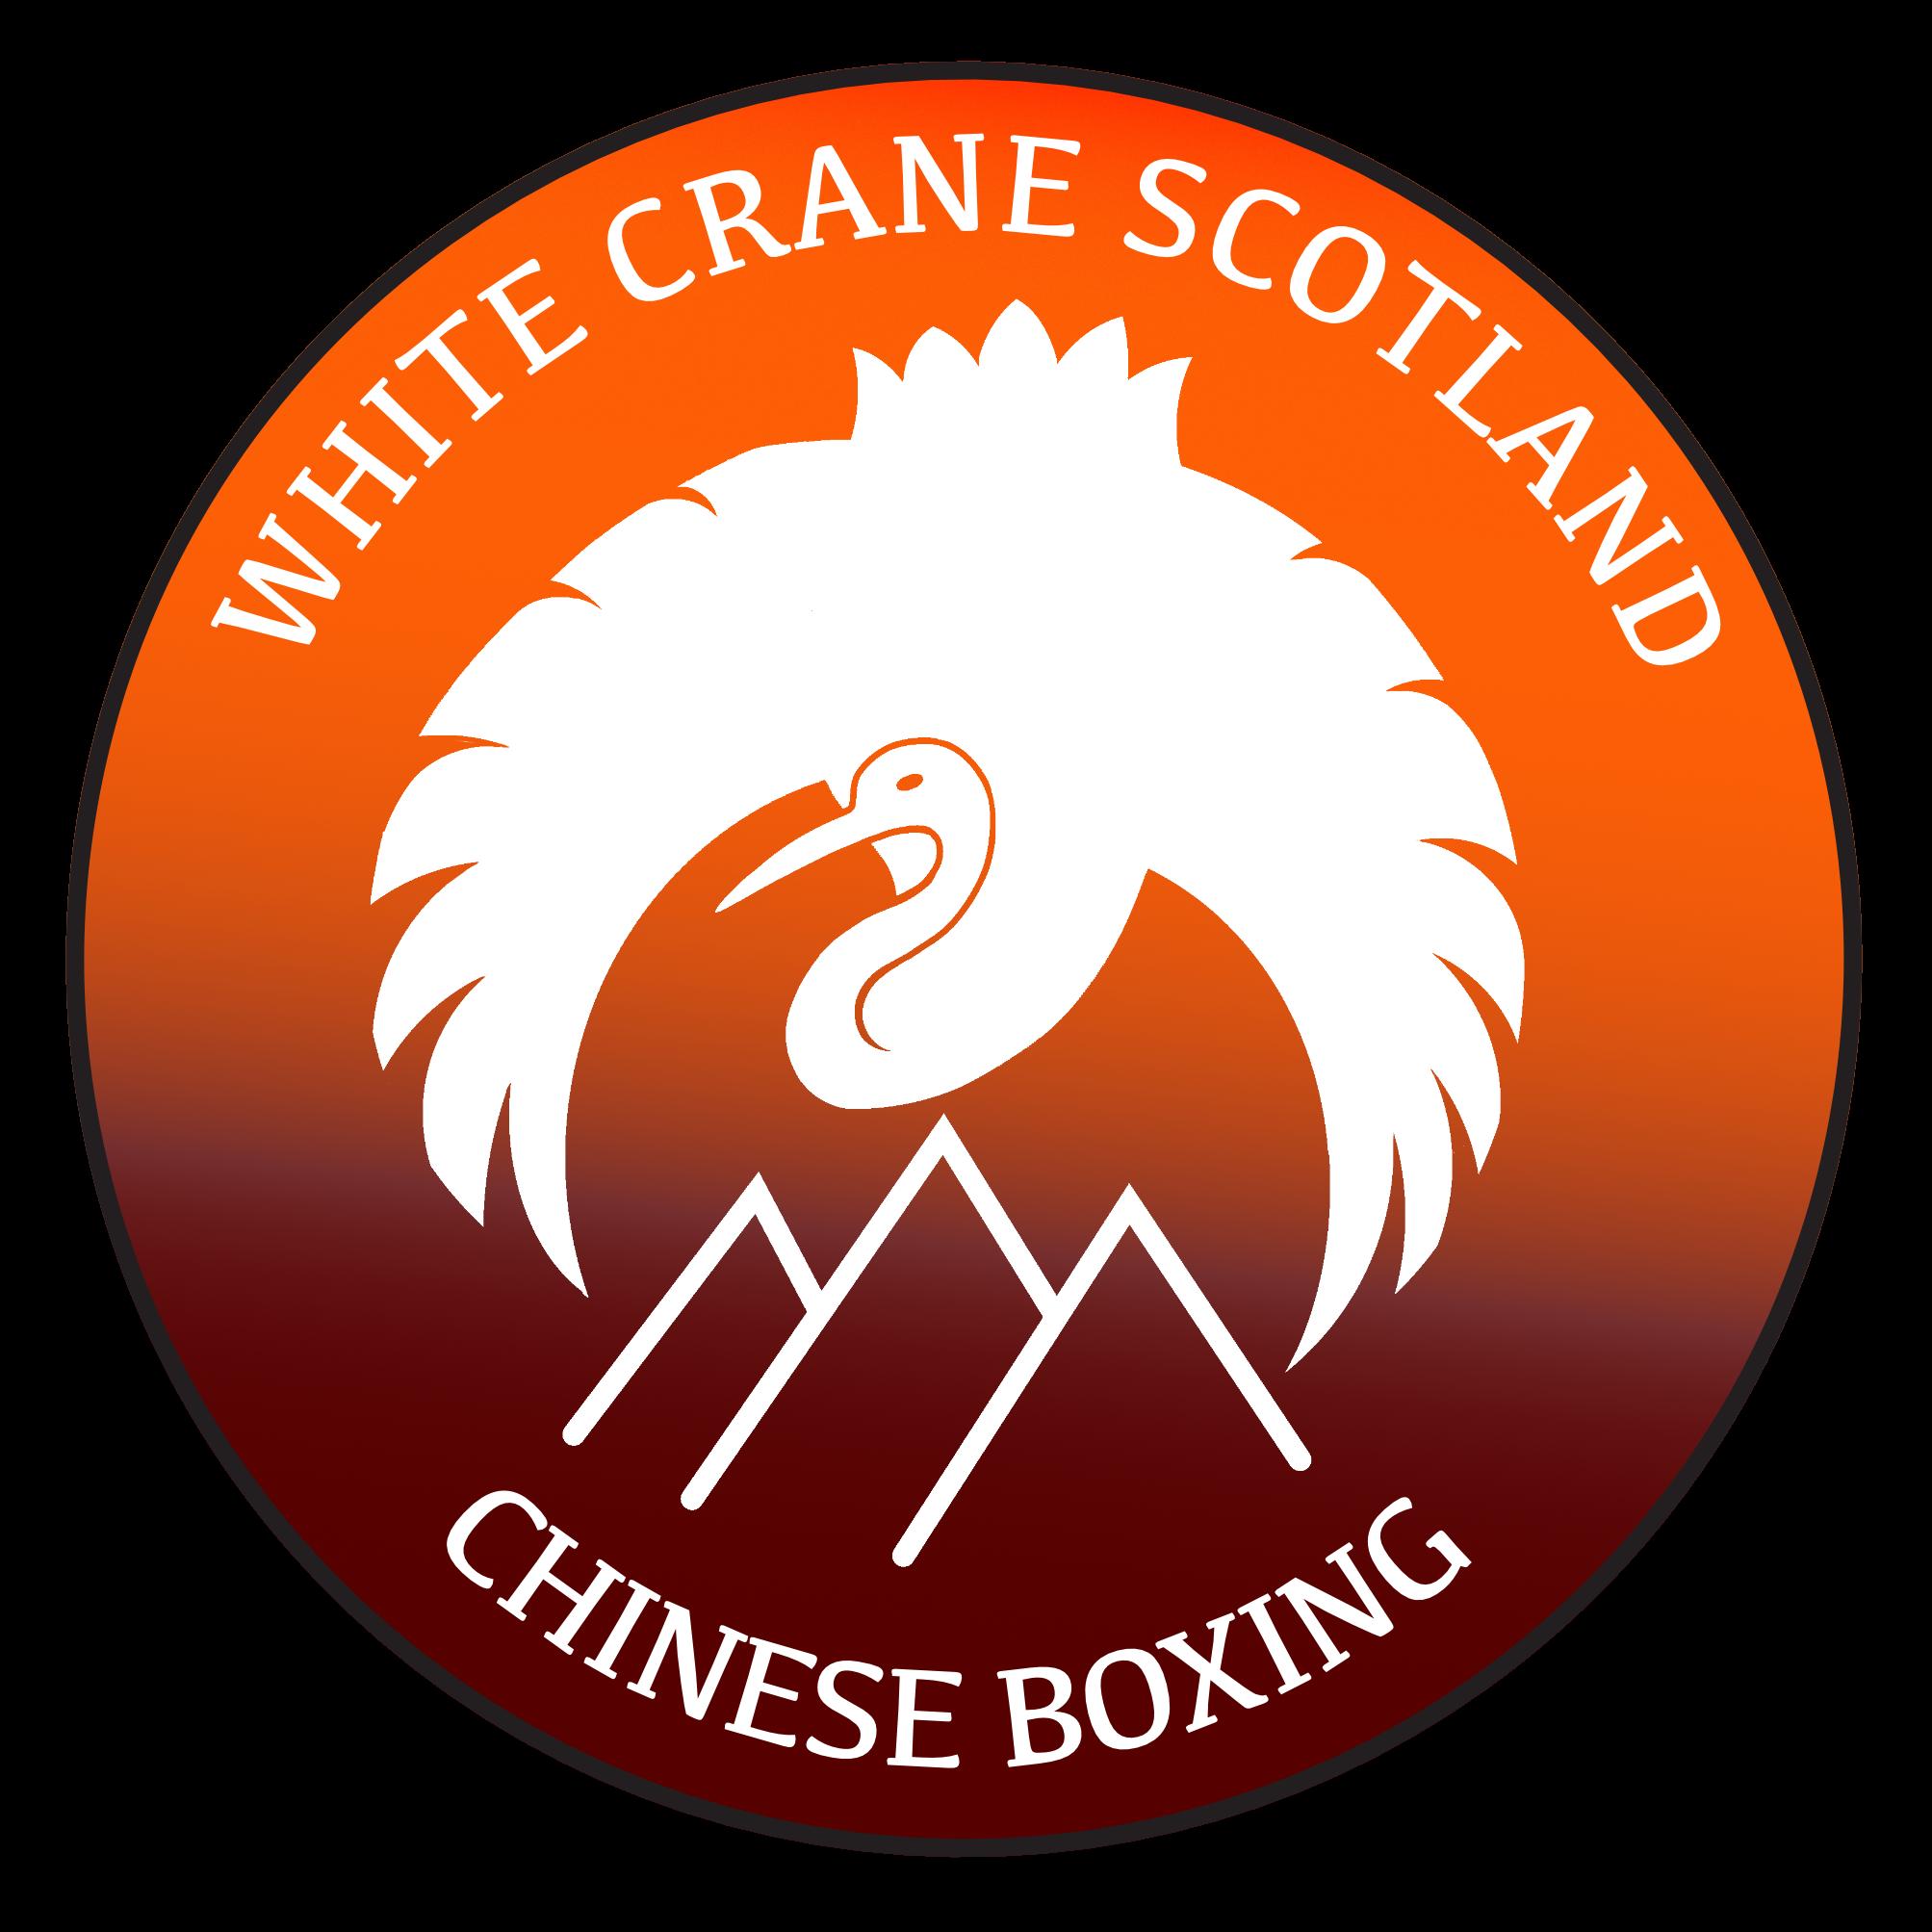 White Crane Scotland 2019.png